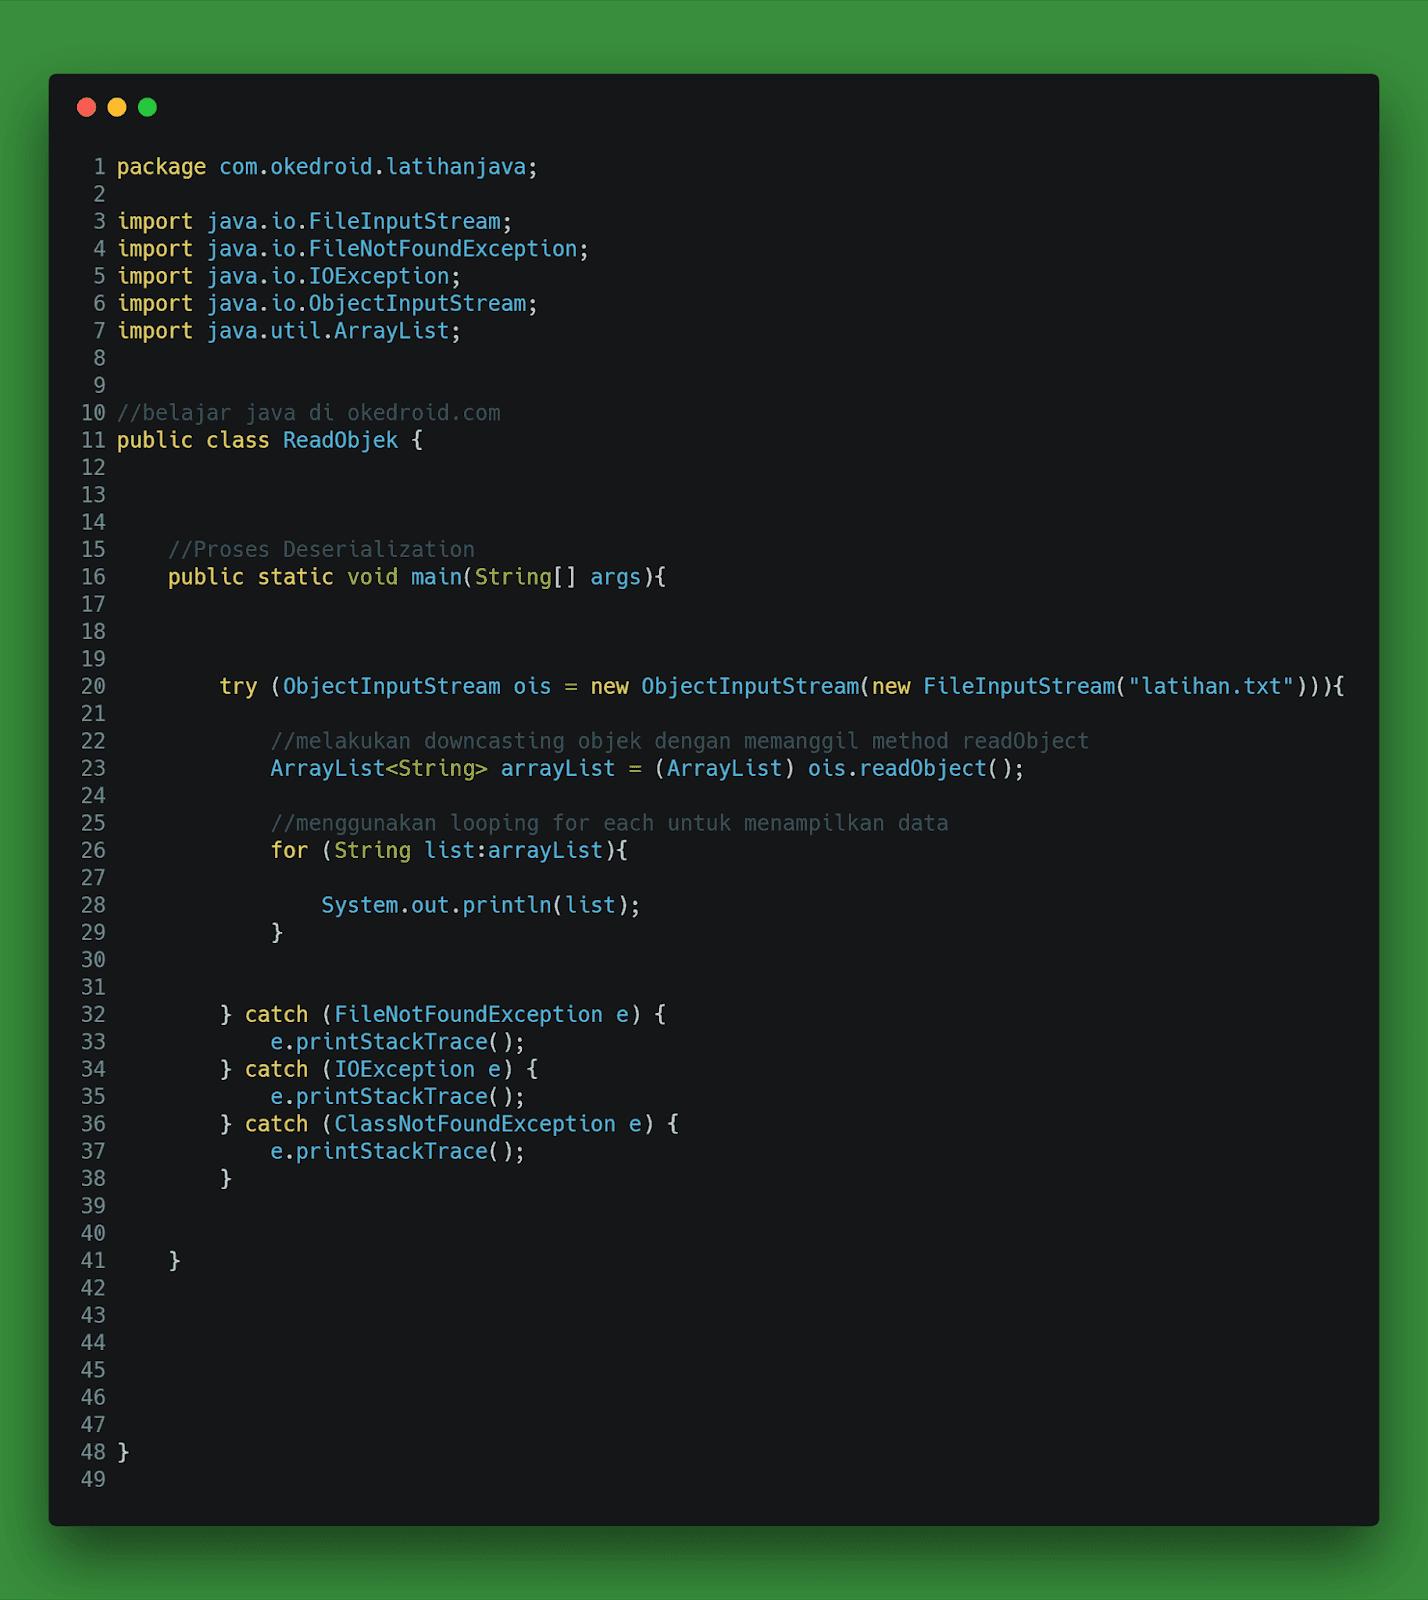 Contoh Code fungsi program  Proses Deserialization deserialisasi arraylist di java